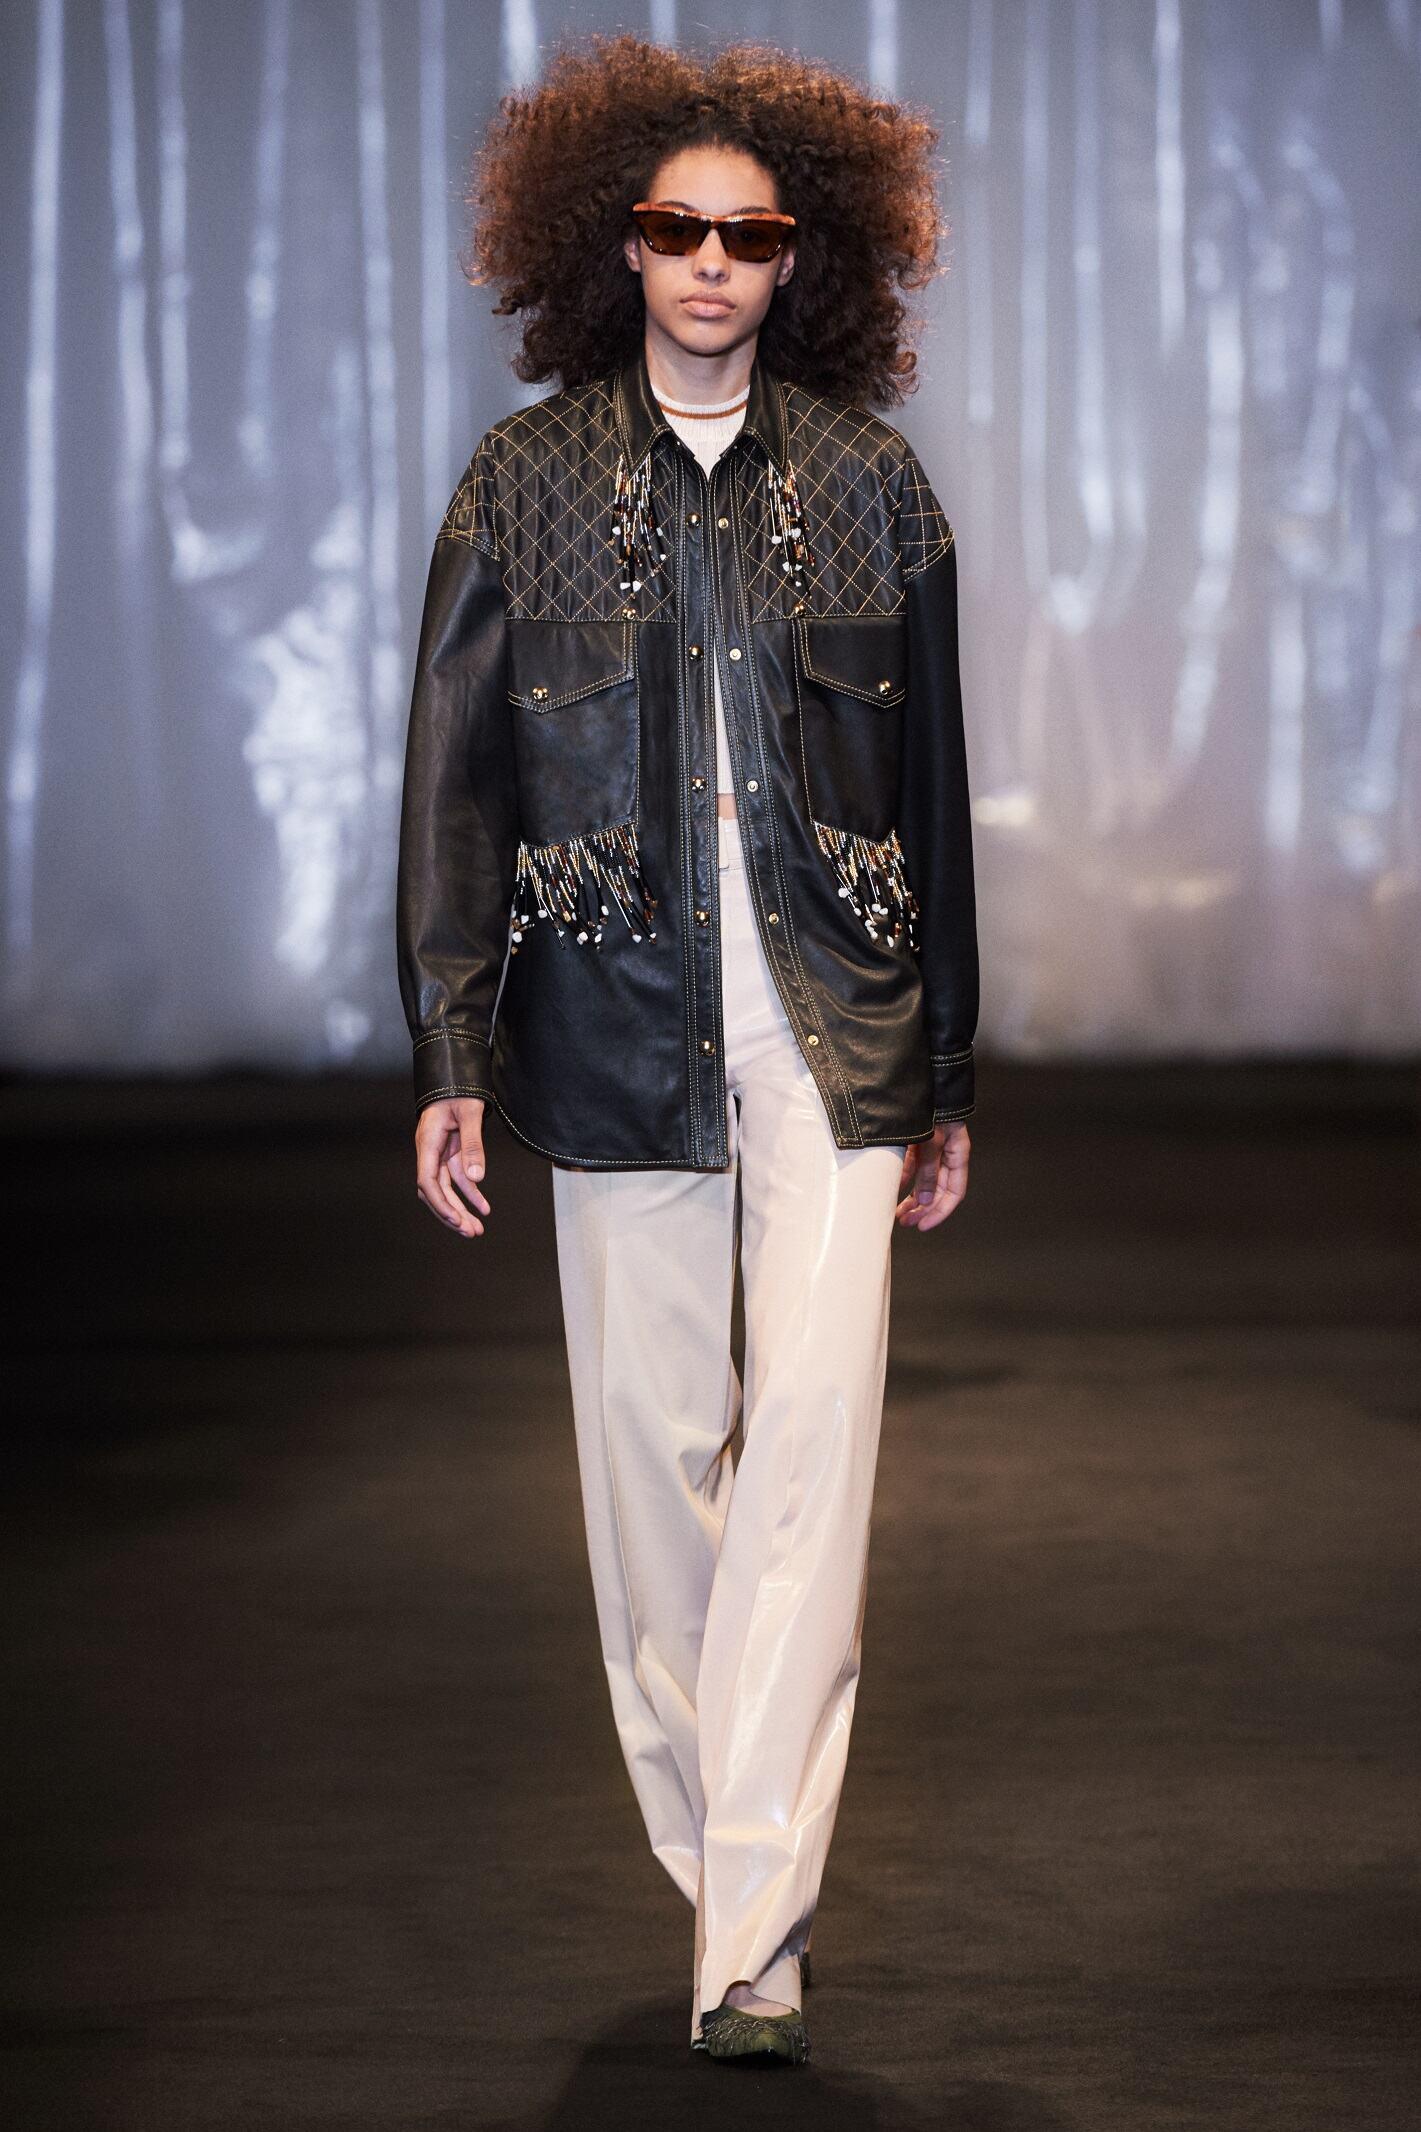 Fashion Woman Model Acne Studios Catwalk